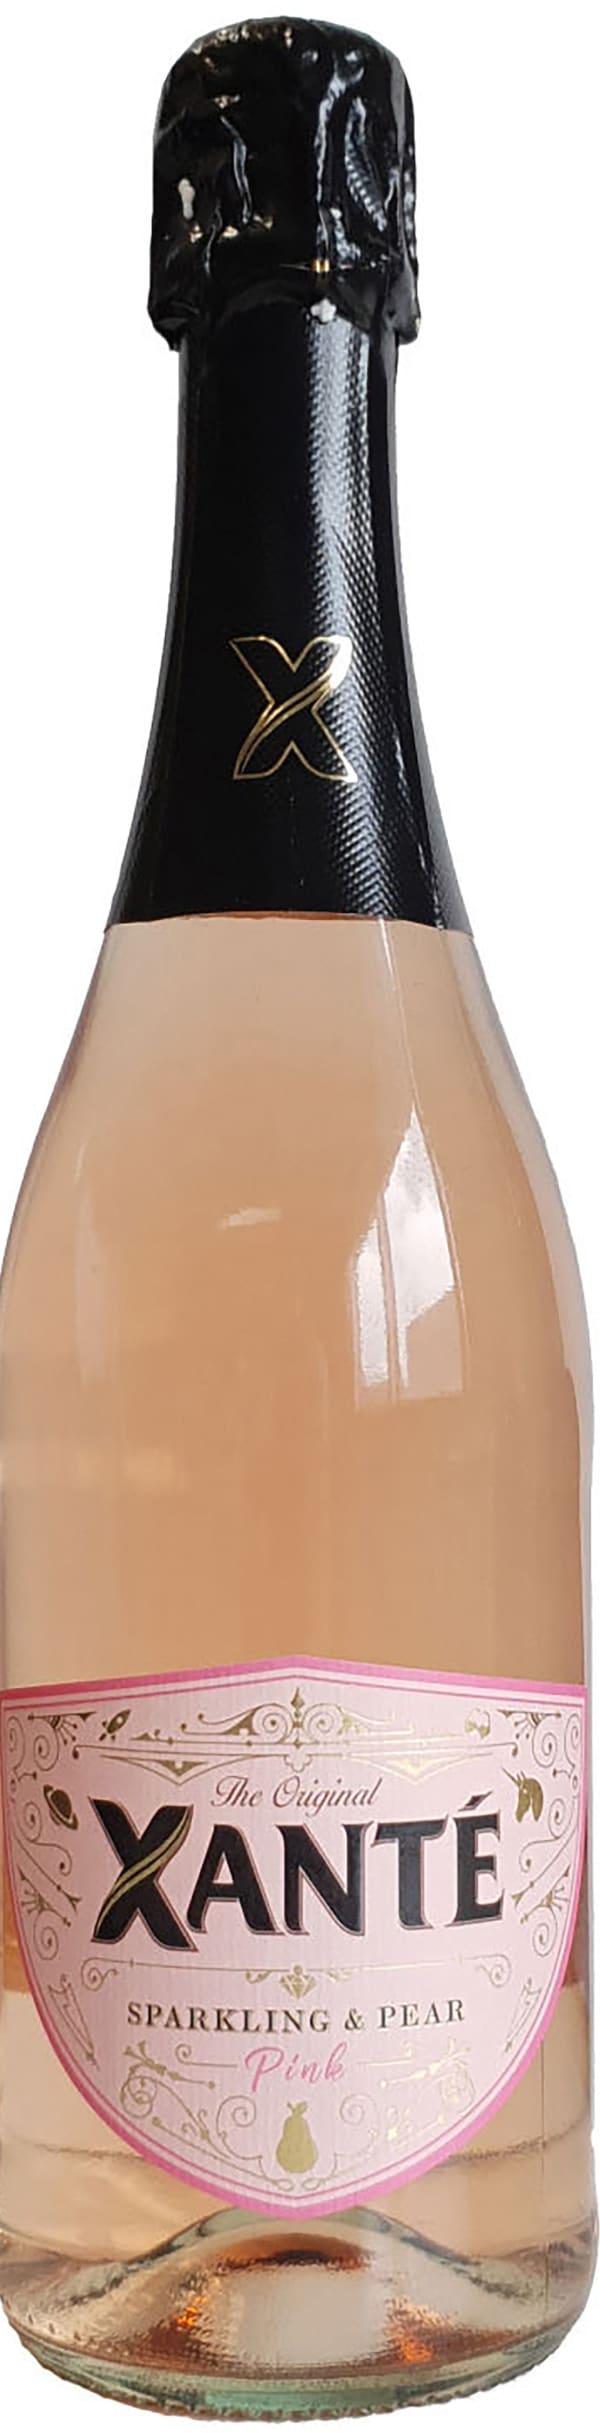 Xante Sparkling & Pear Pink